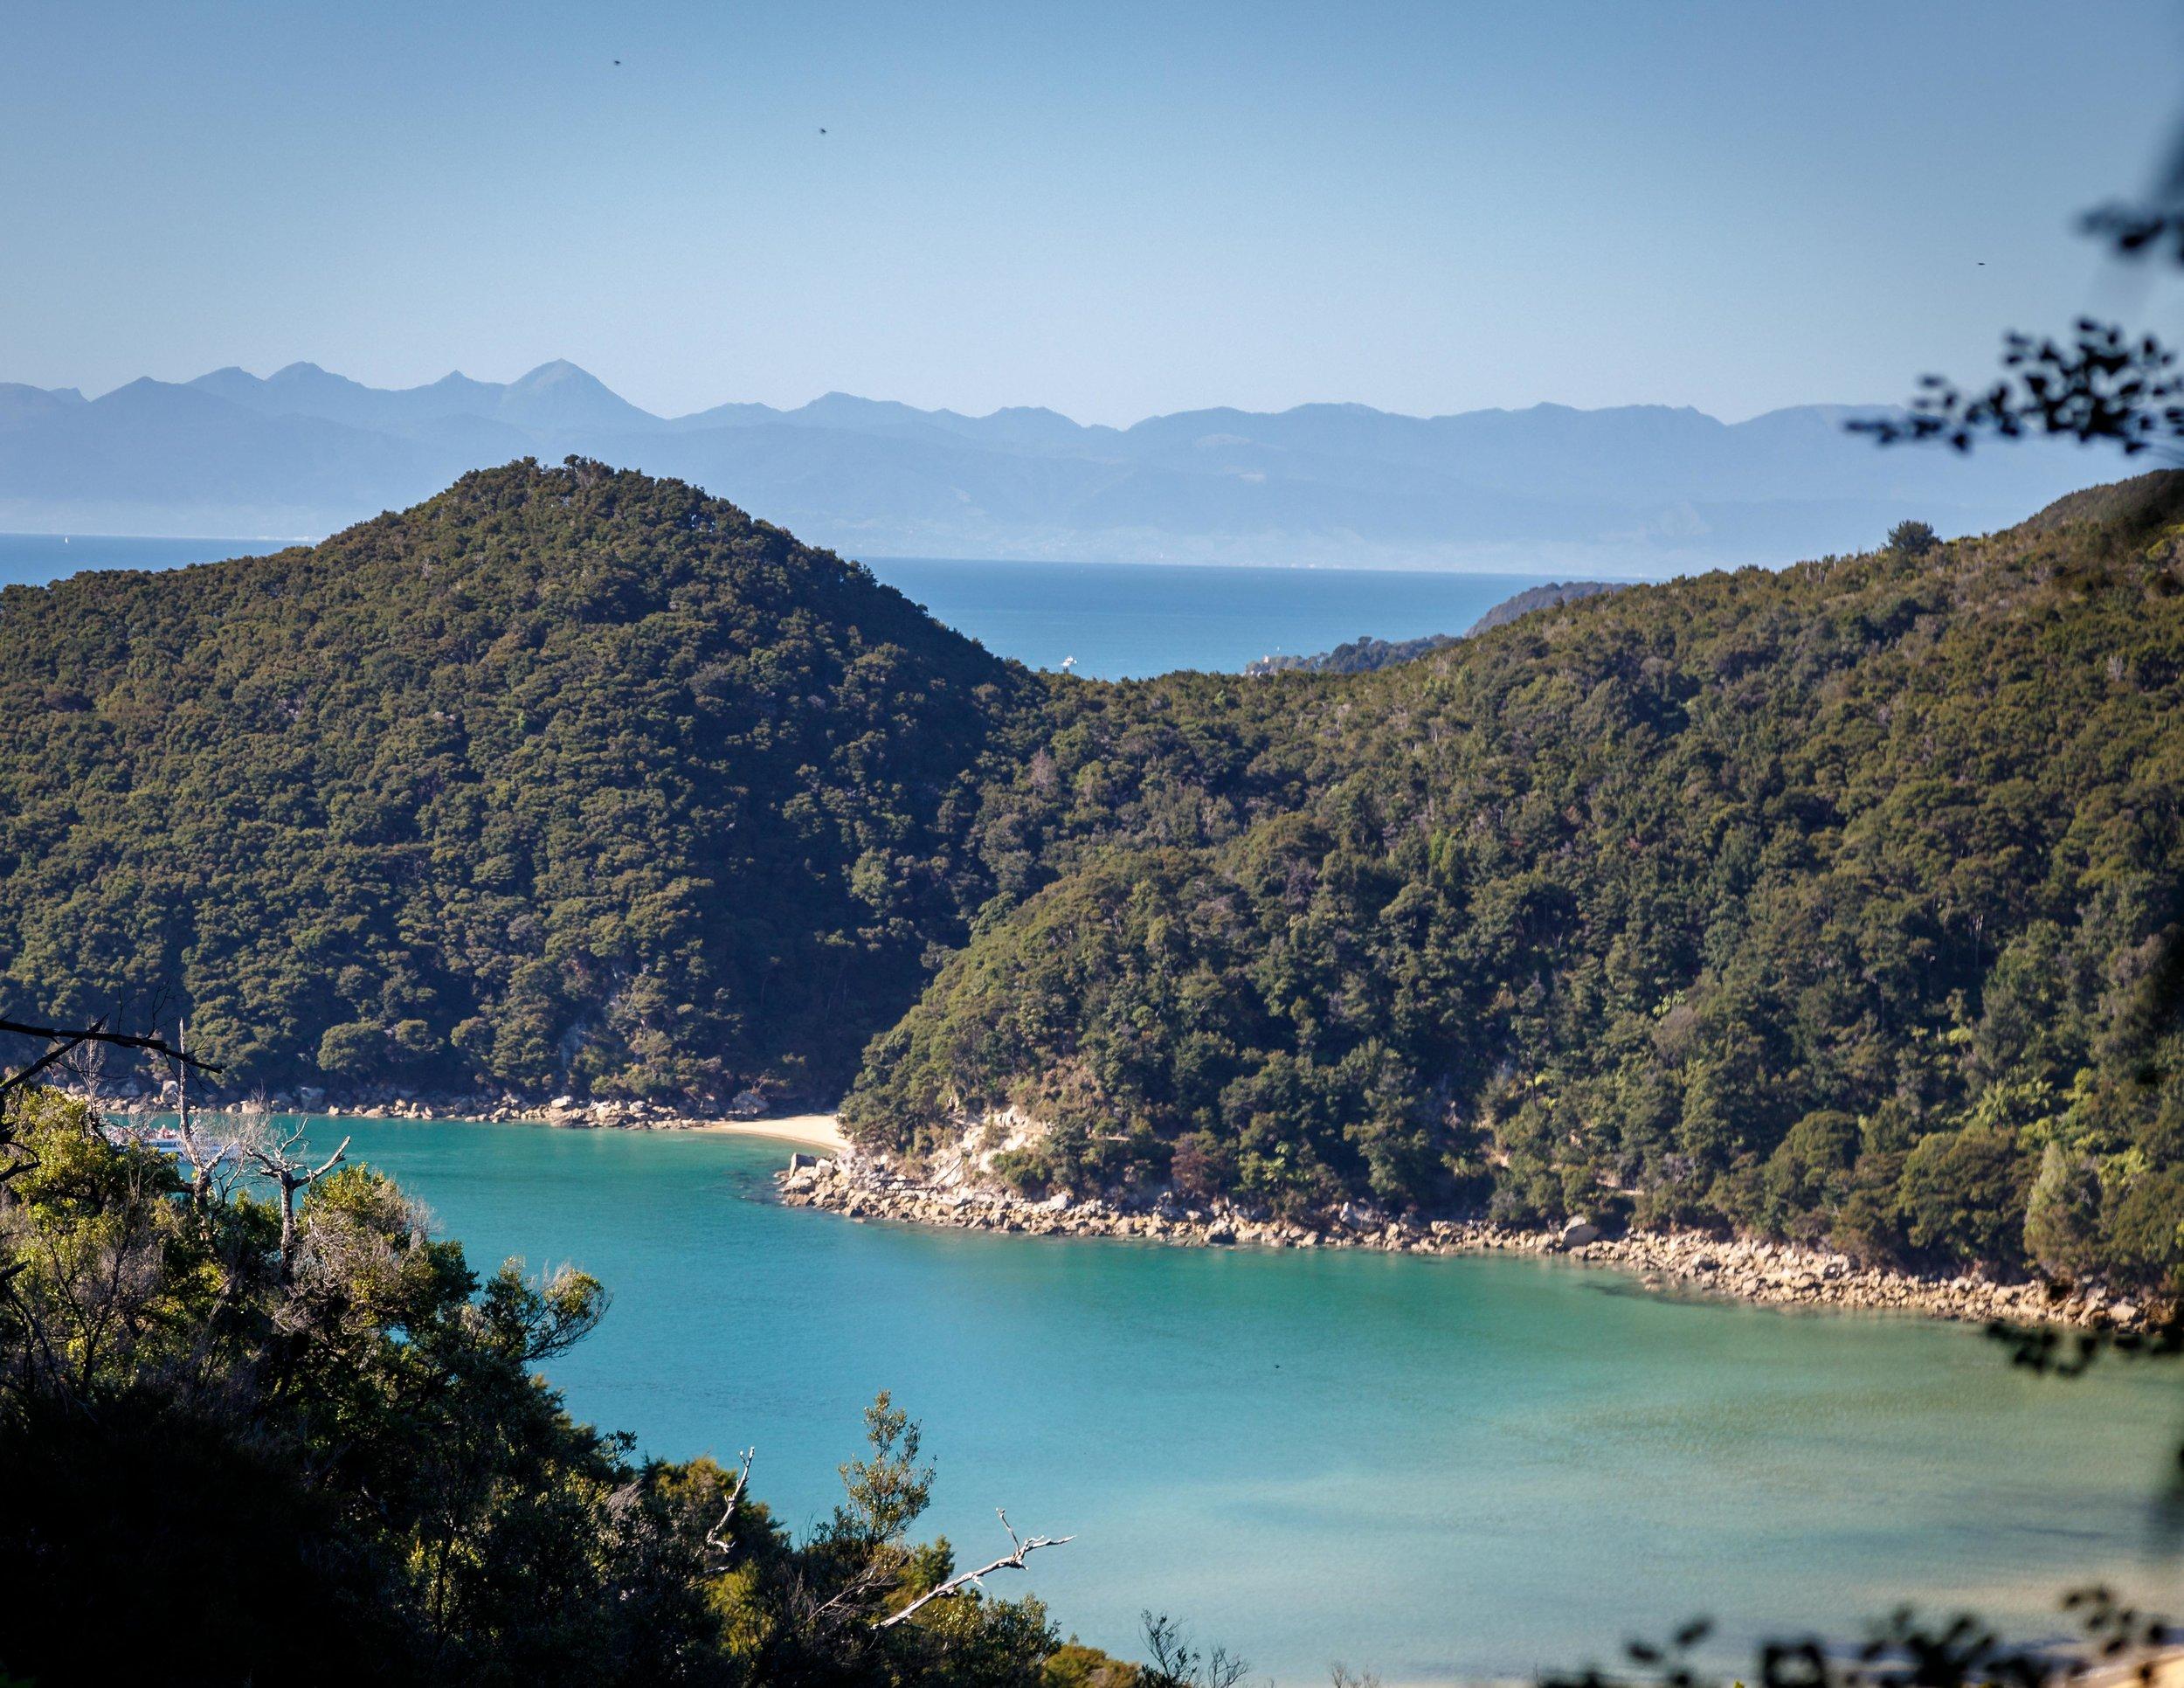 The view of Bark Bay, Abel Tasman Track